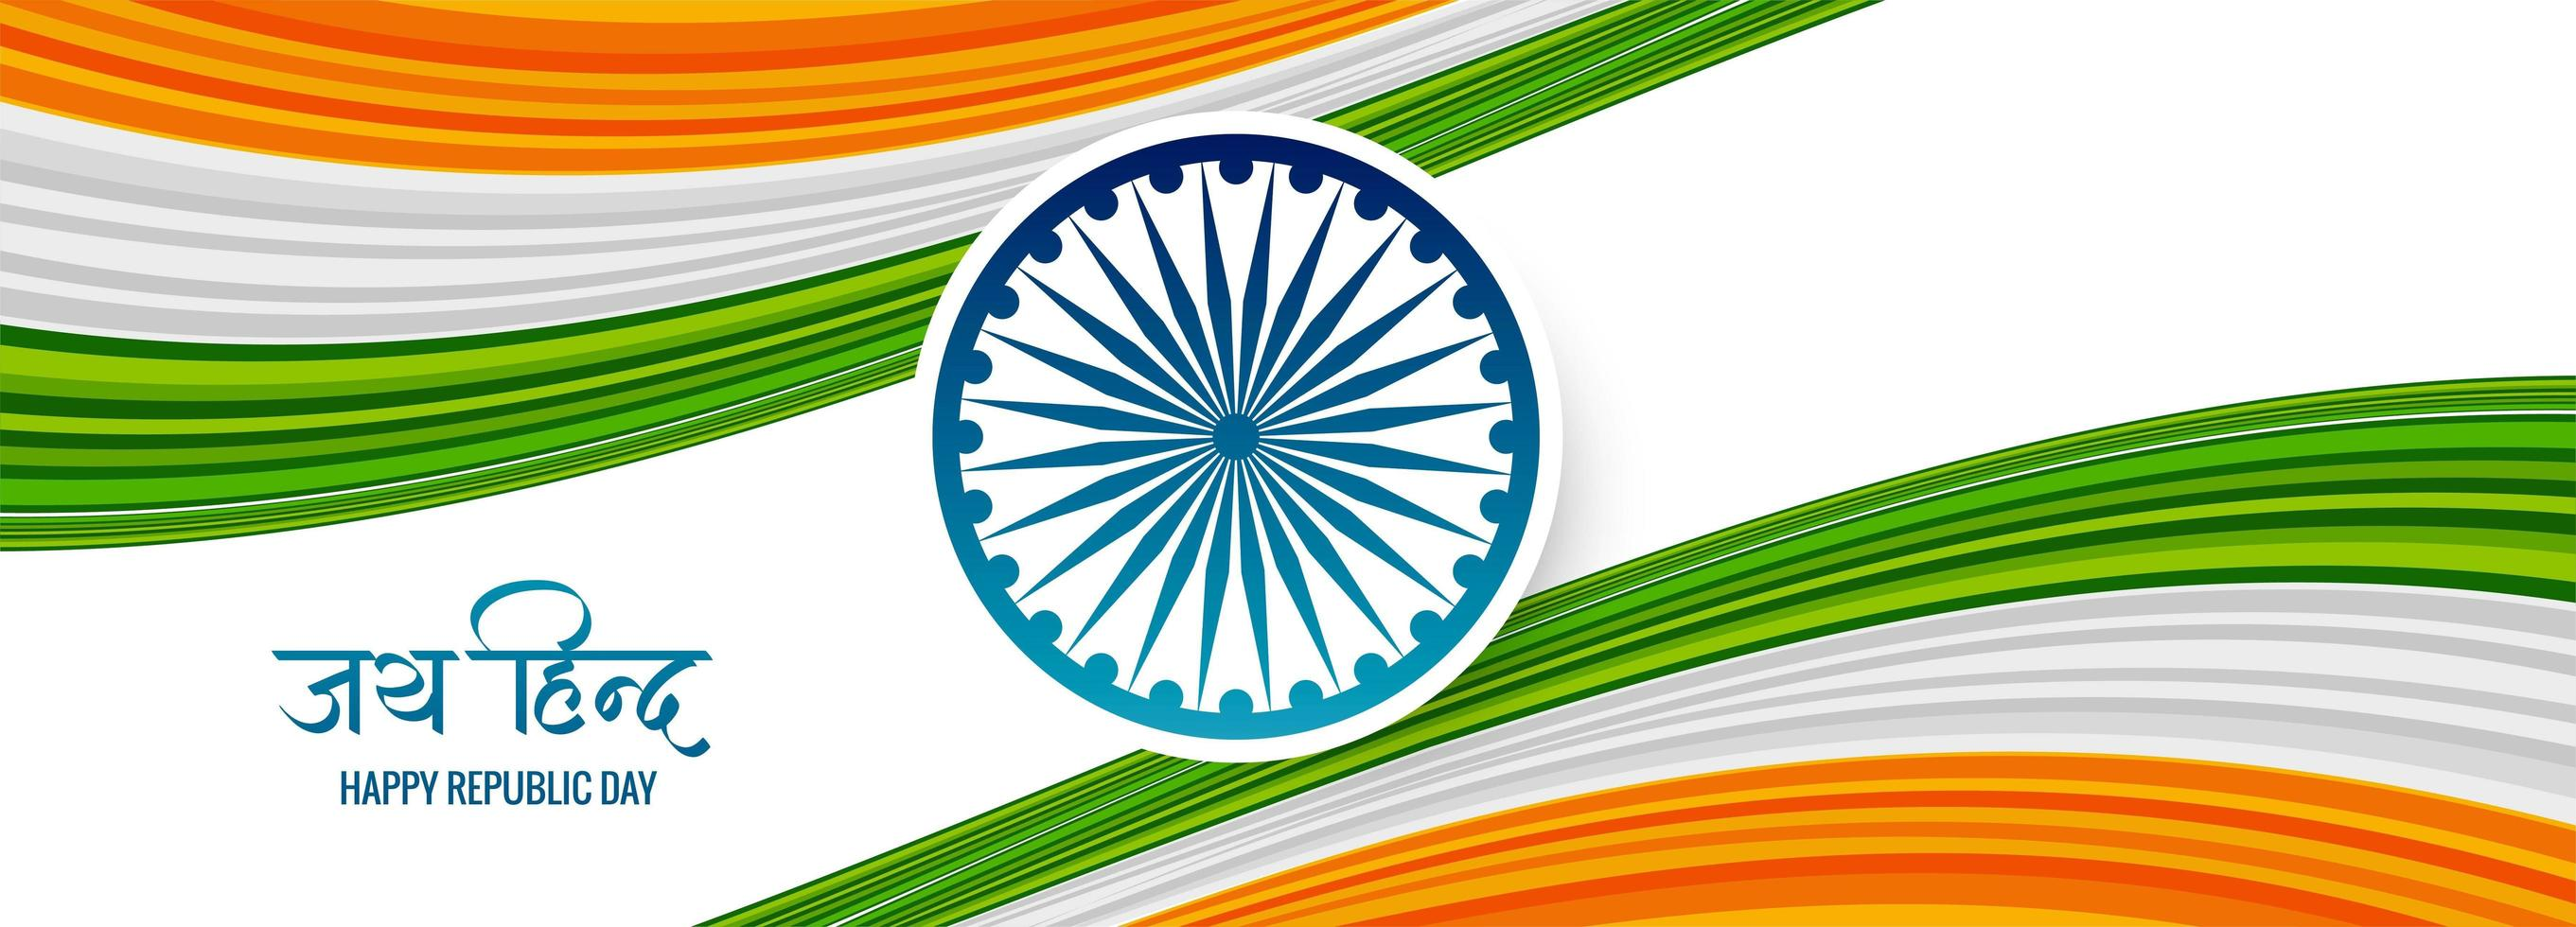 Bandiera indiana onda banner design